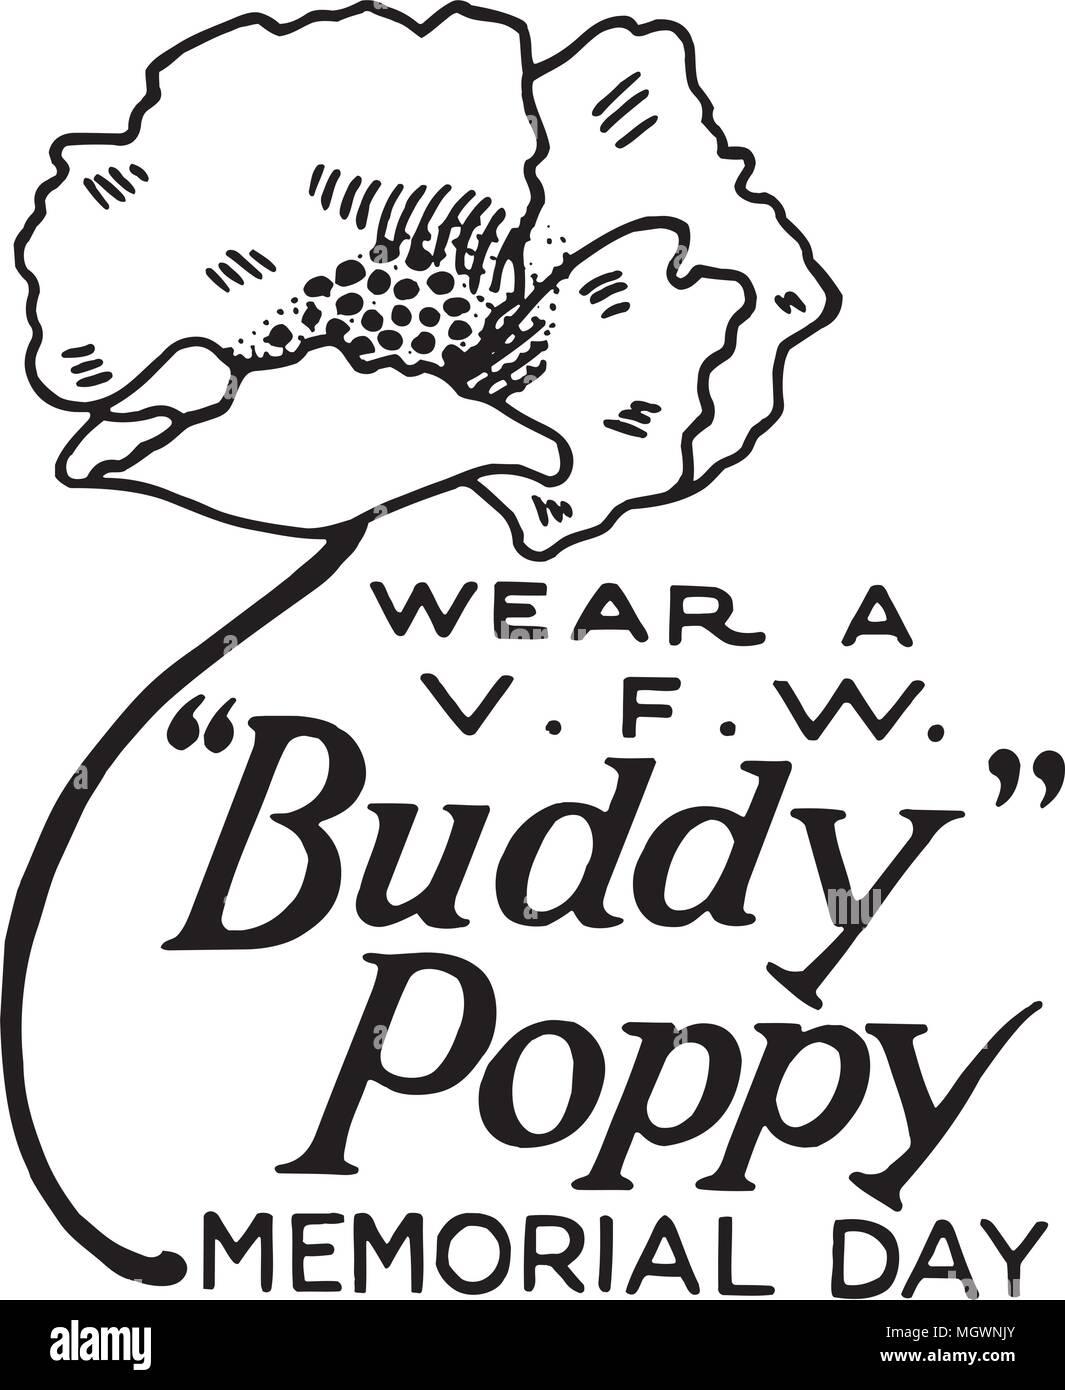 Wear A Buddy Poppy - Retro Ad Art Banner - Stock Vector